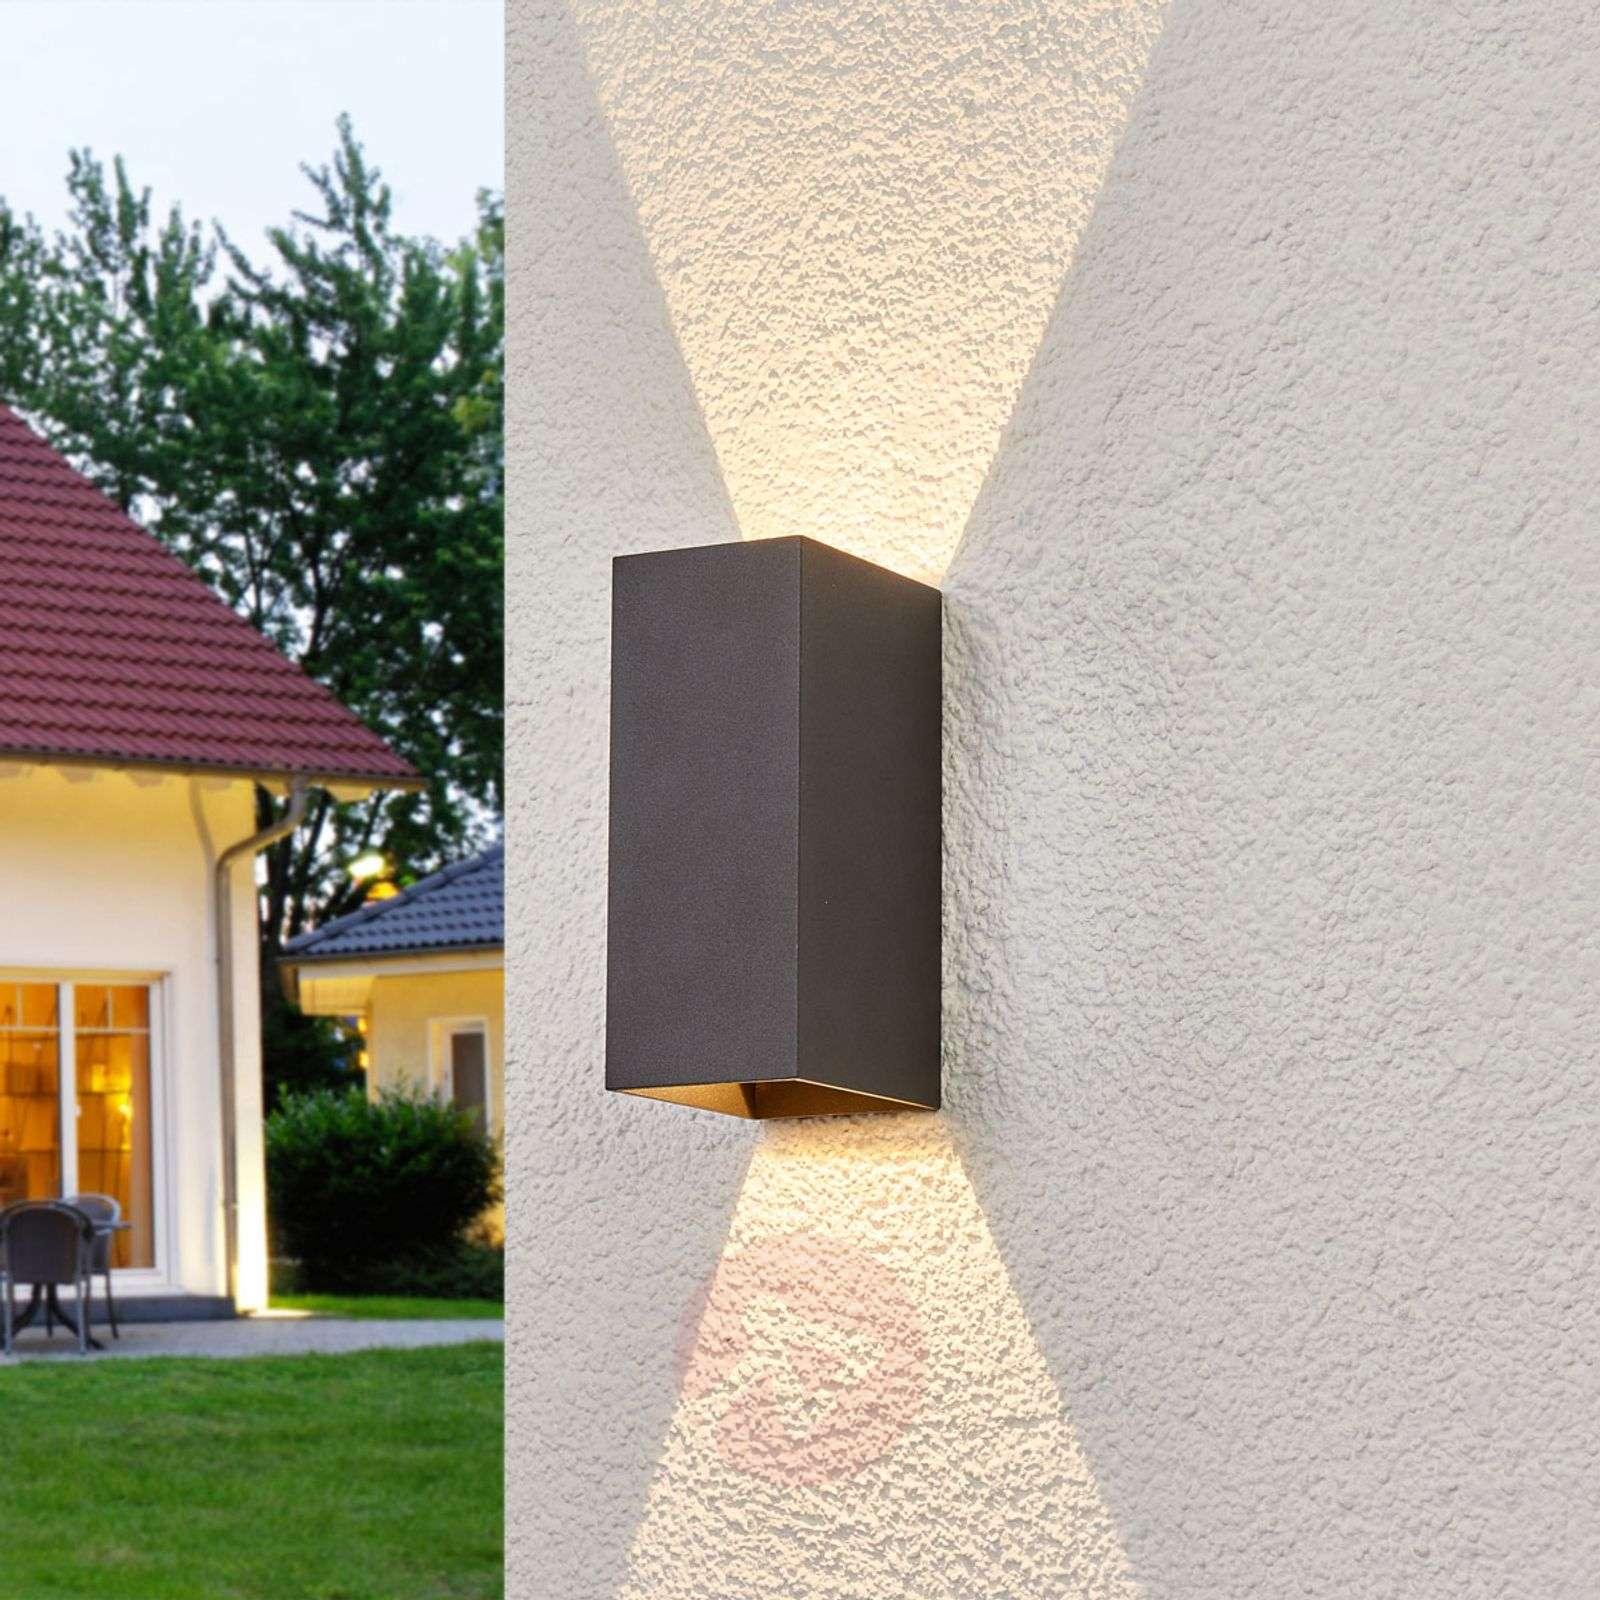 Mikka 2-bulb LED outdoor wall light-9969032-02